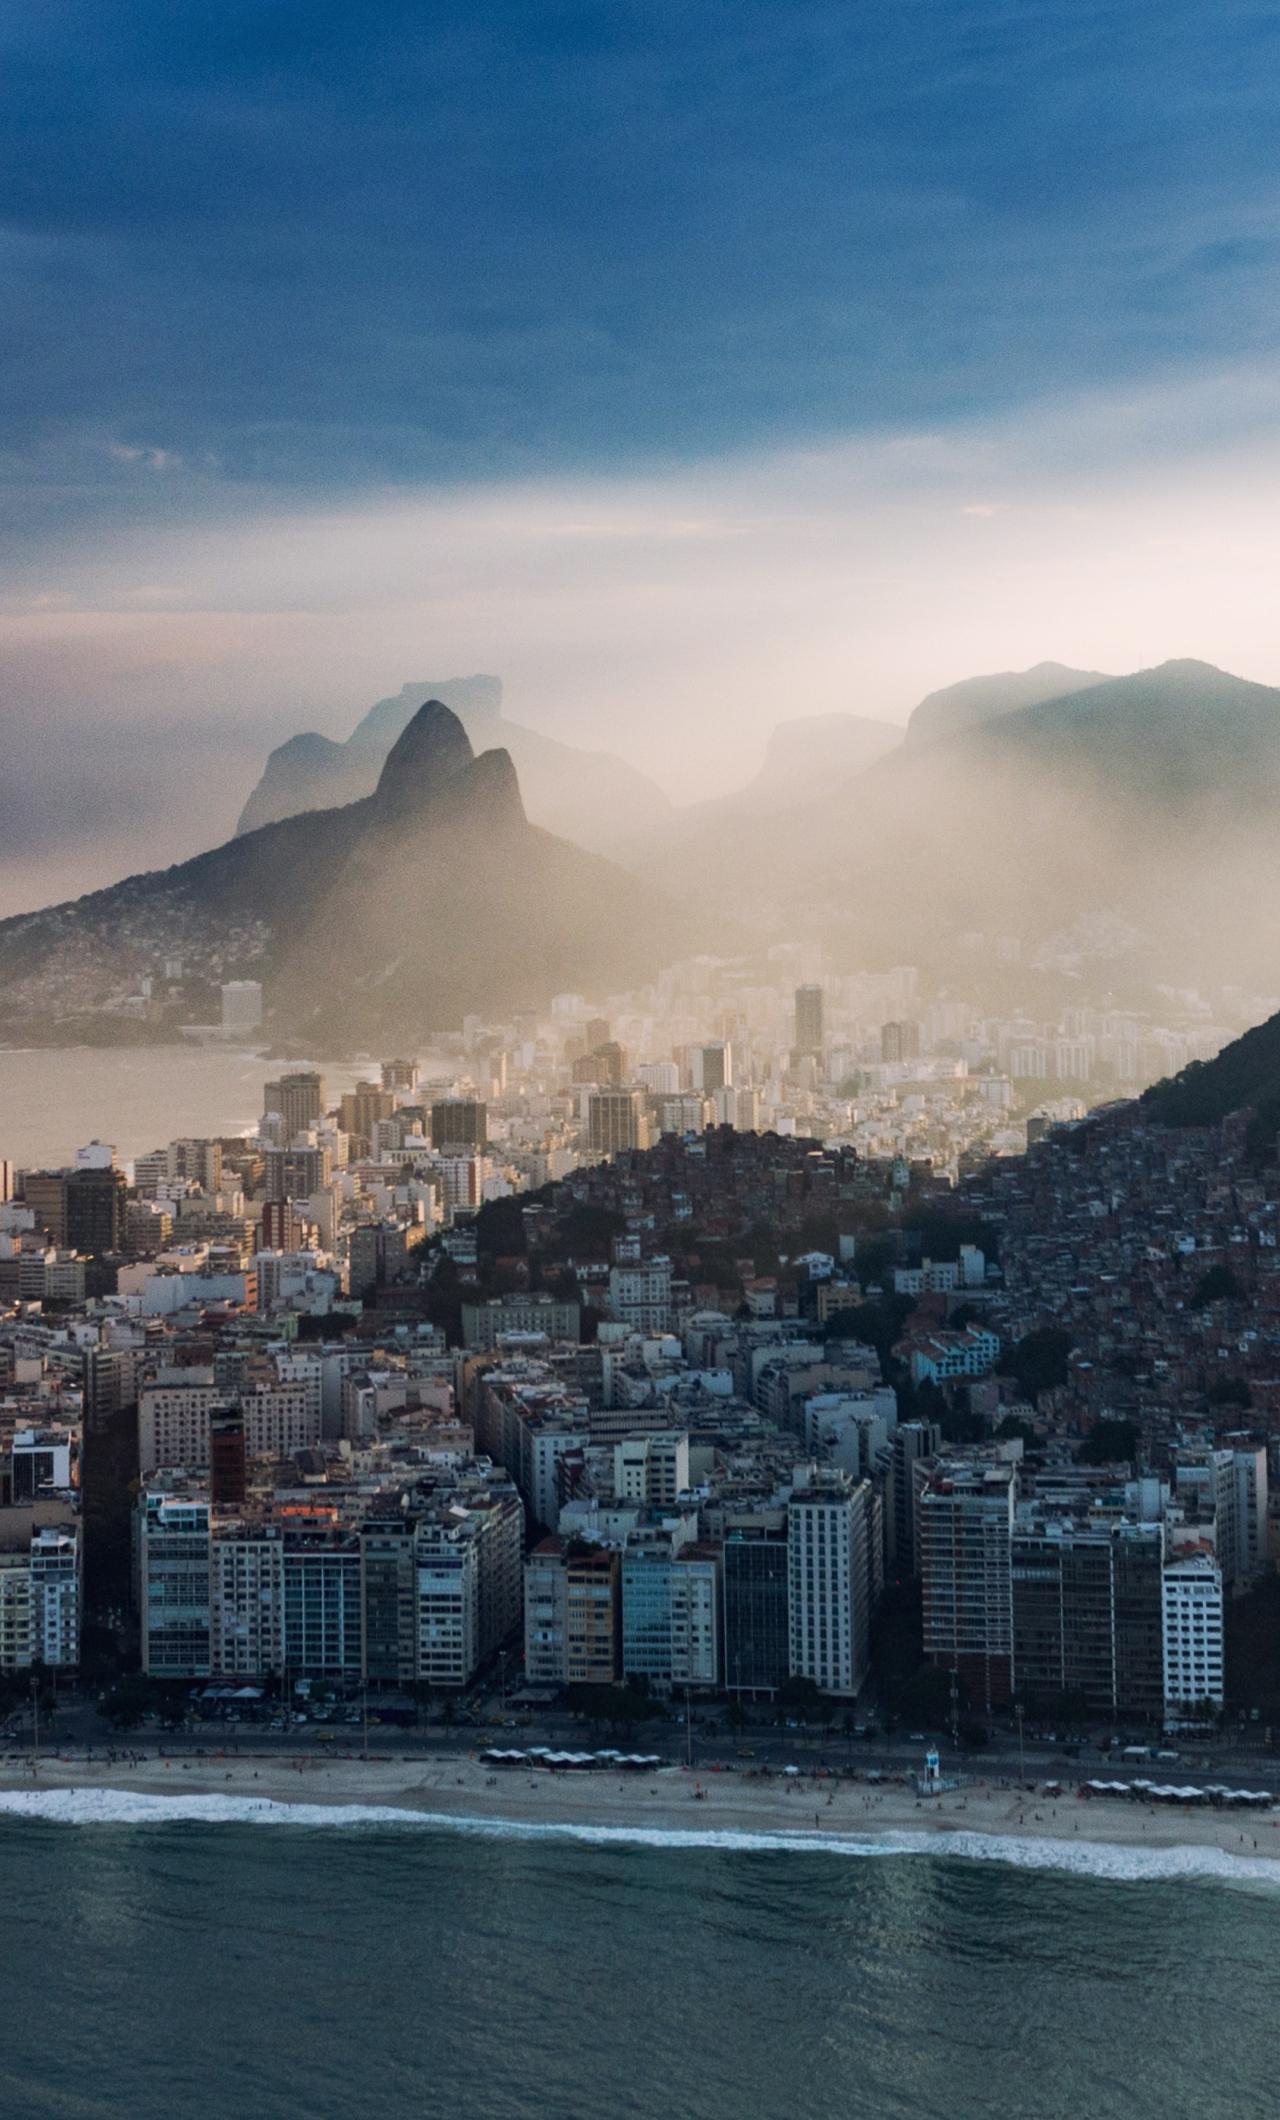 Download 1280x2120 Wallpaper Rio De Janeiro City Buildings